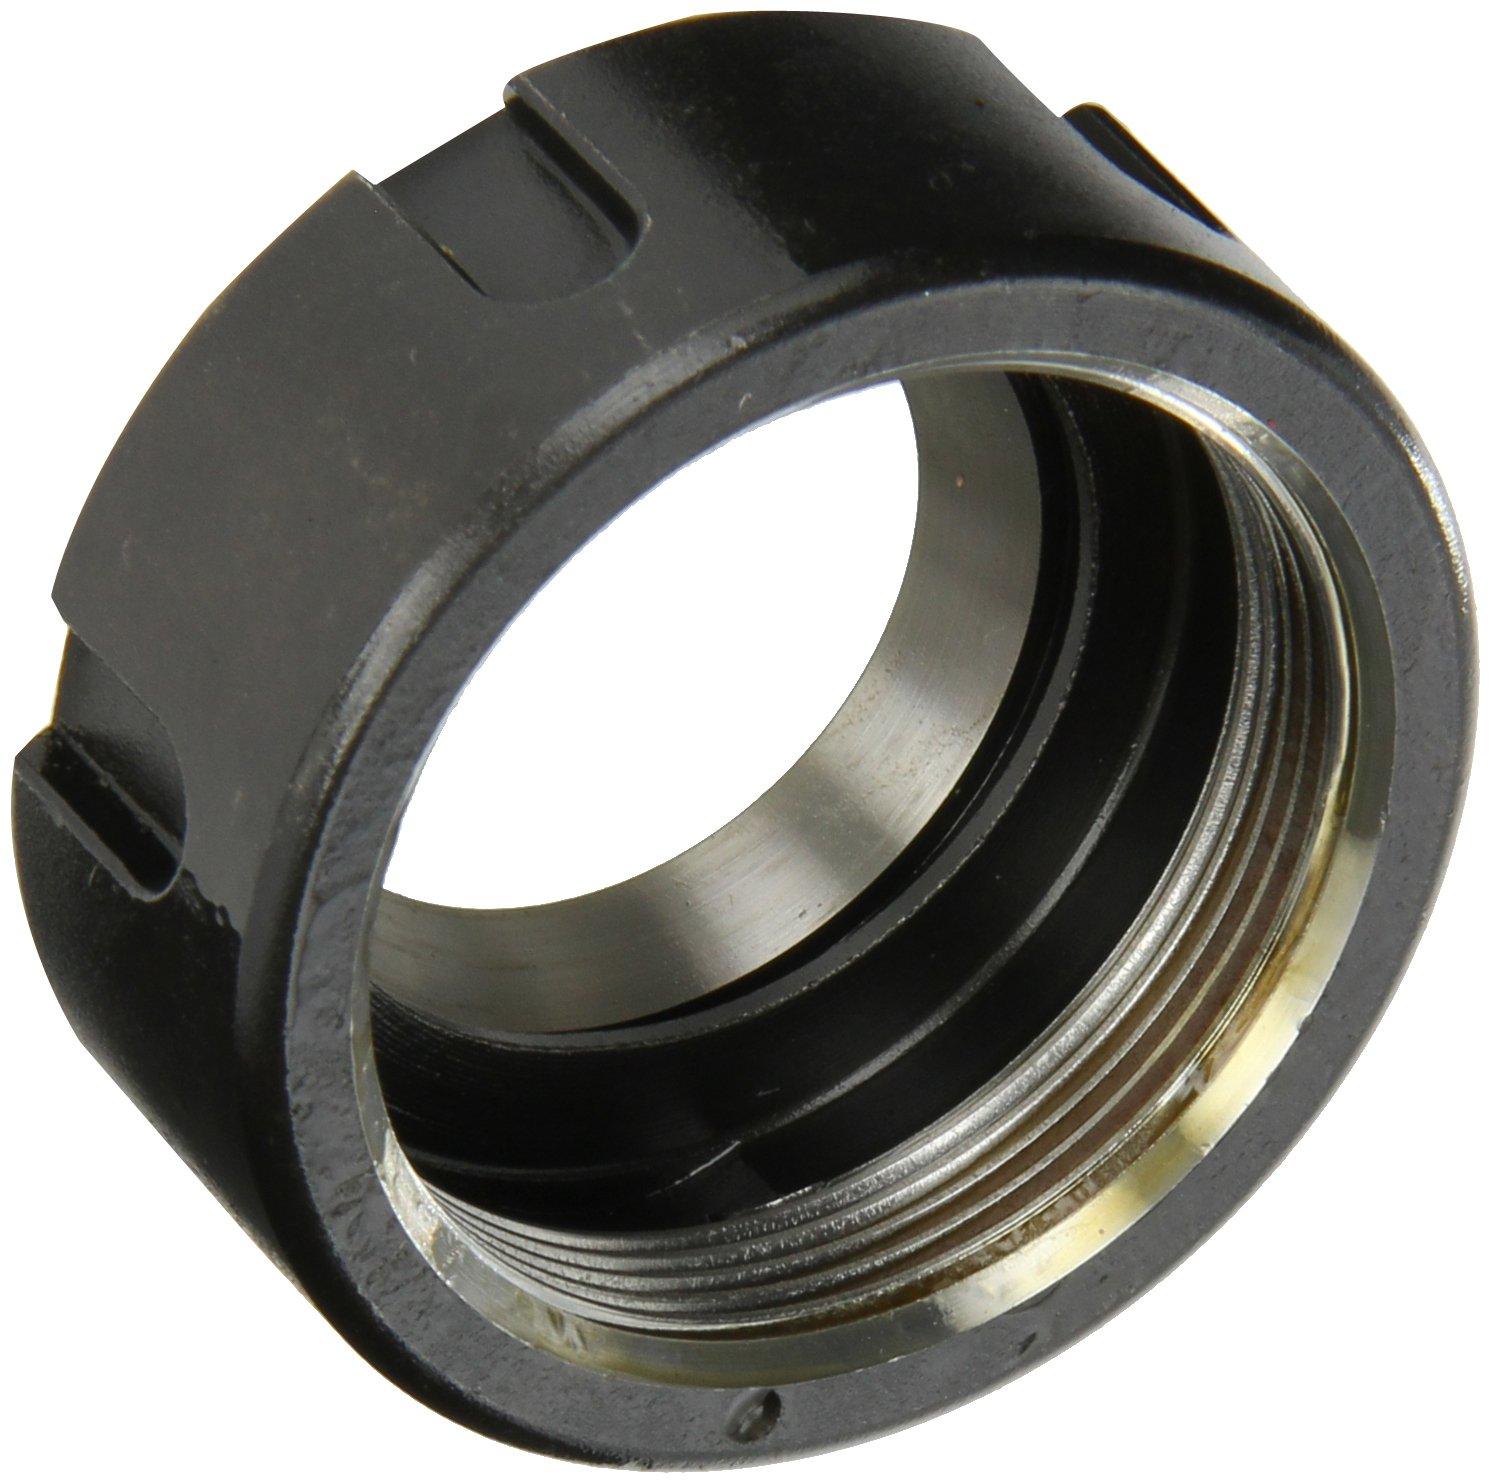 Dorian Tool ER32NTS50 Standard Nut for ER32 Ultra Precision Collets, M40 x 1.5 Thread, 50mm Diameter x 22.5mm Height